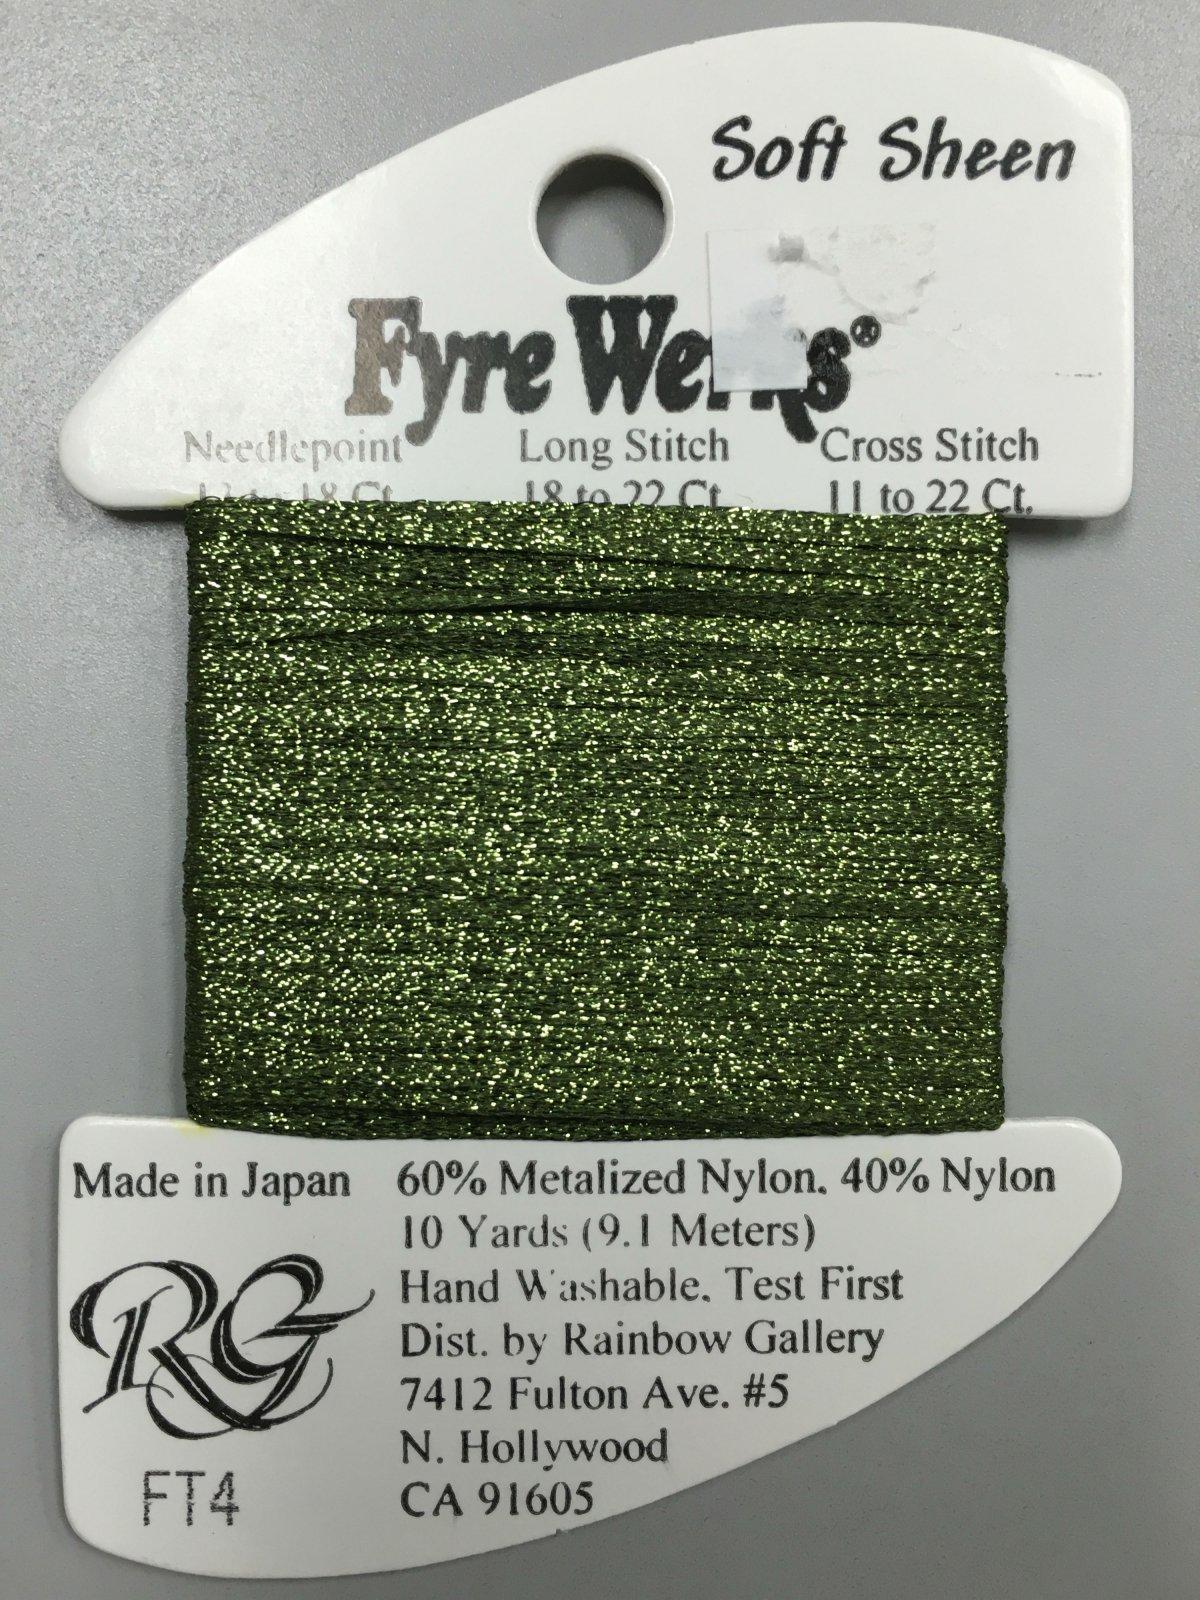 Fyre Werks Soft Sheen FT4